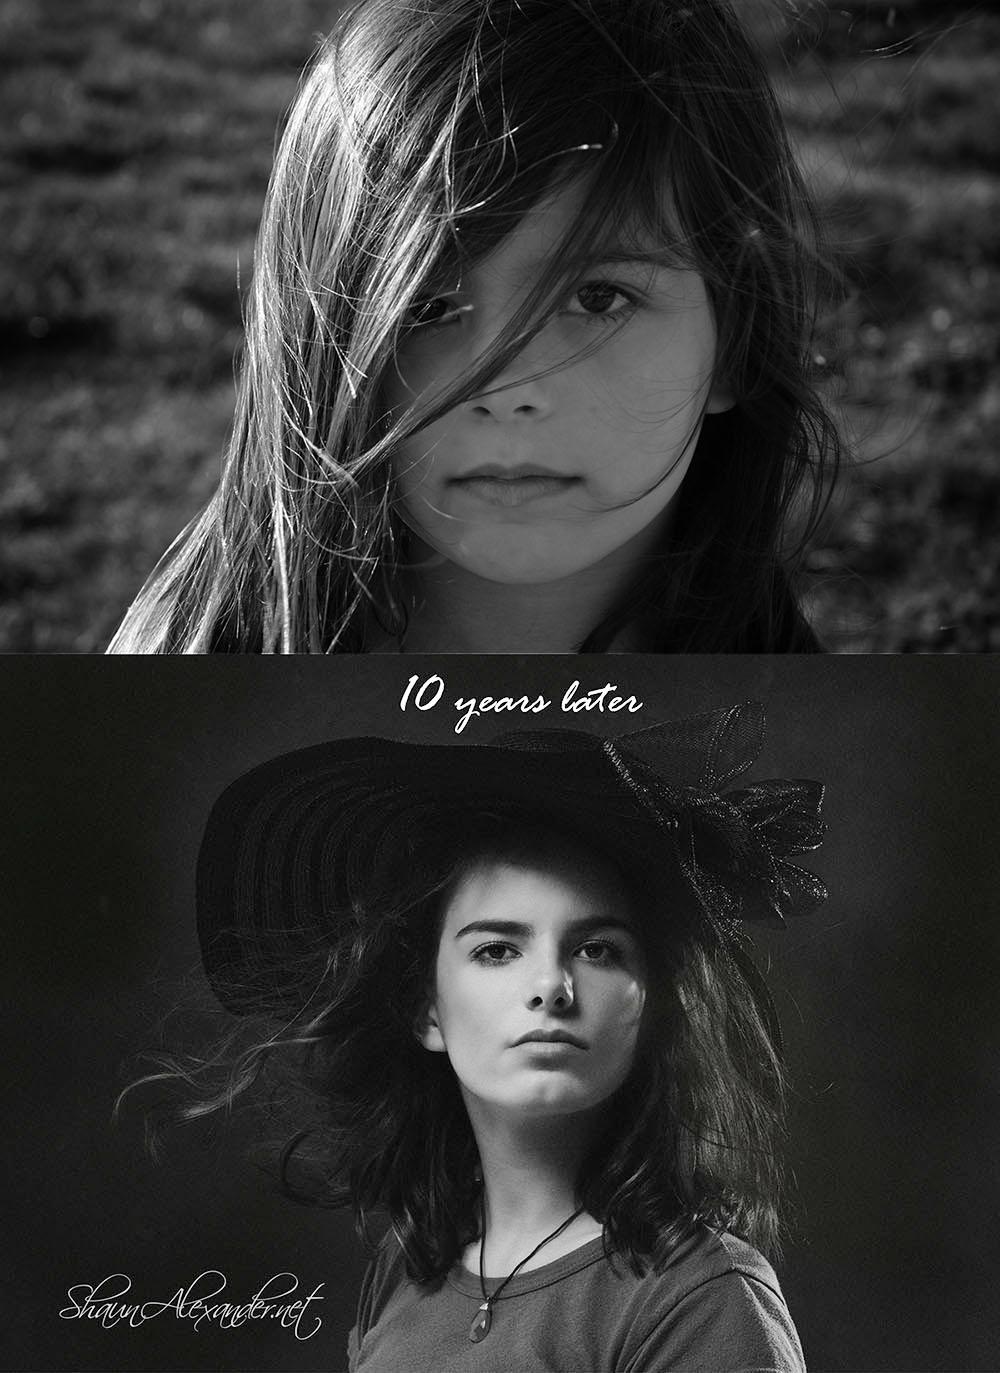 Hight school teen portraits by Shaun Alexander